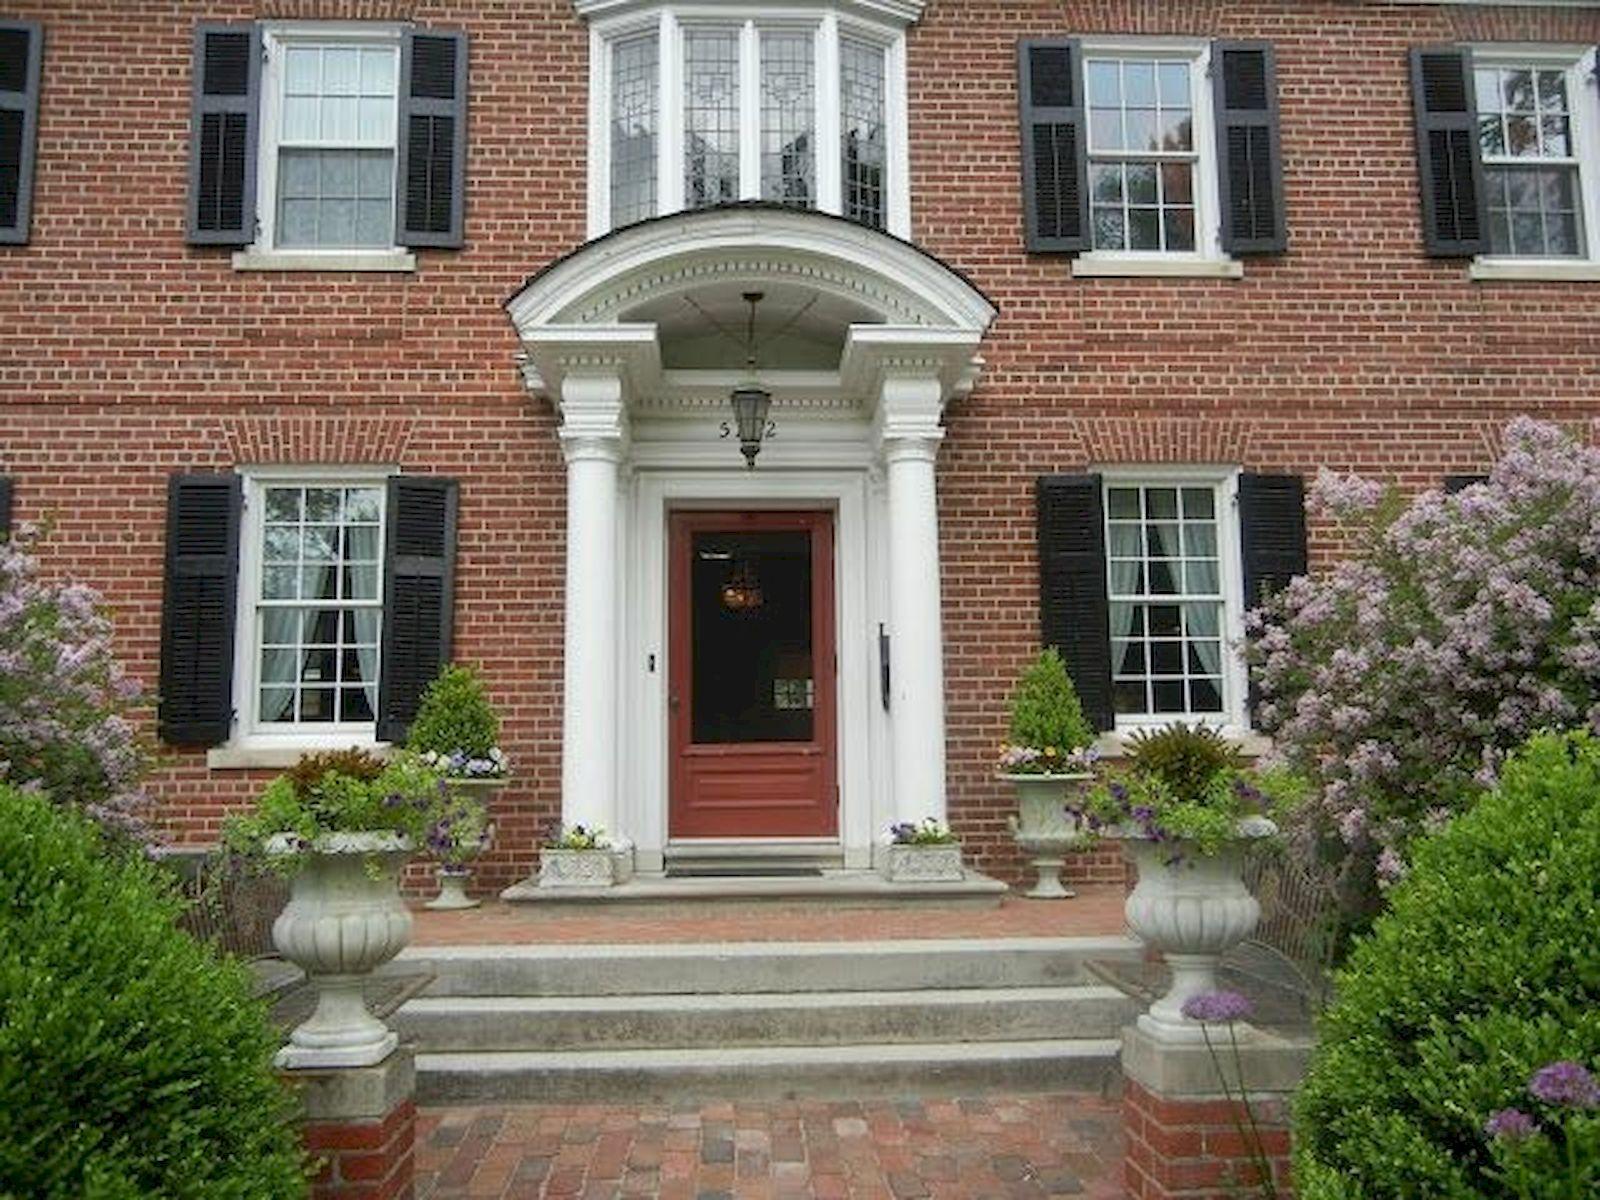 70 Stunning Exterior House Design Ideas (13)